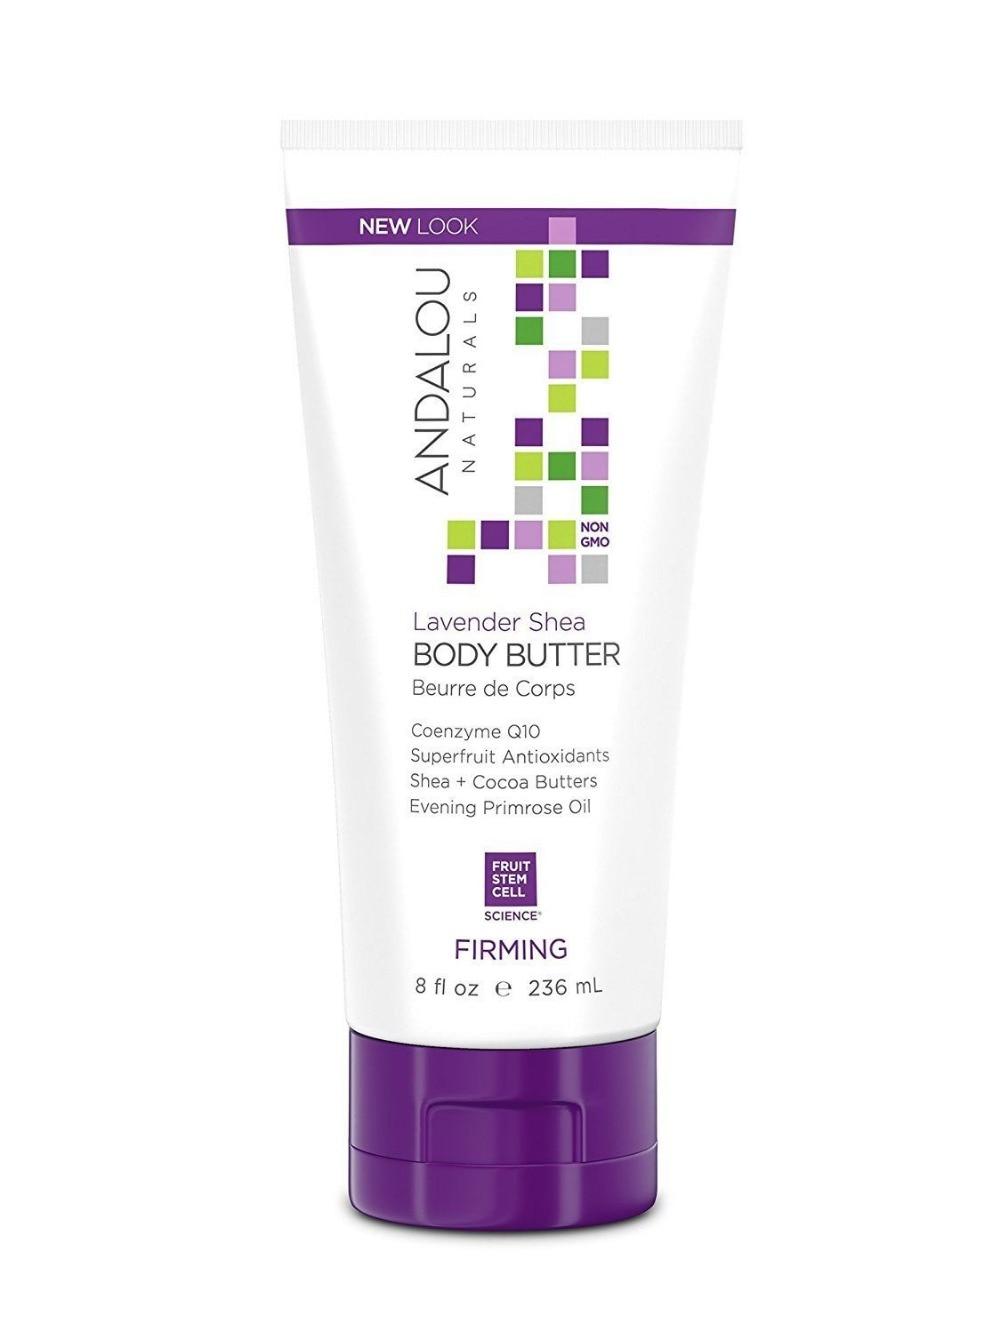 Andalou Naturals Firming Body Butter Lavender Shea - 8 Fl Oz dado sens purderm normalizing cream 1 69 fl oz